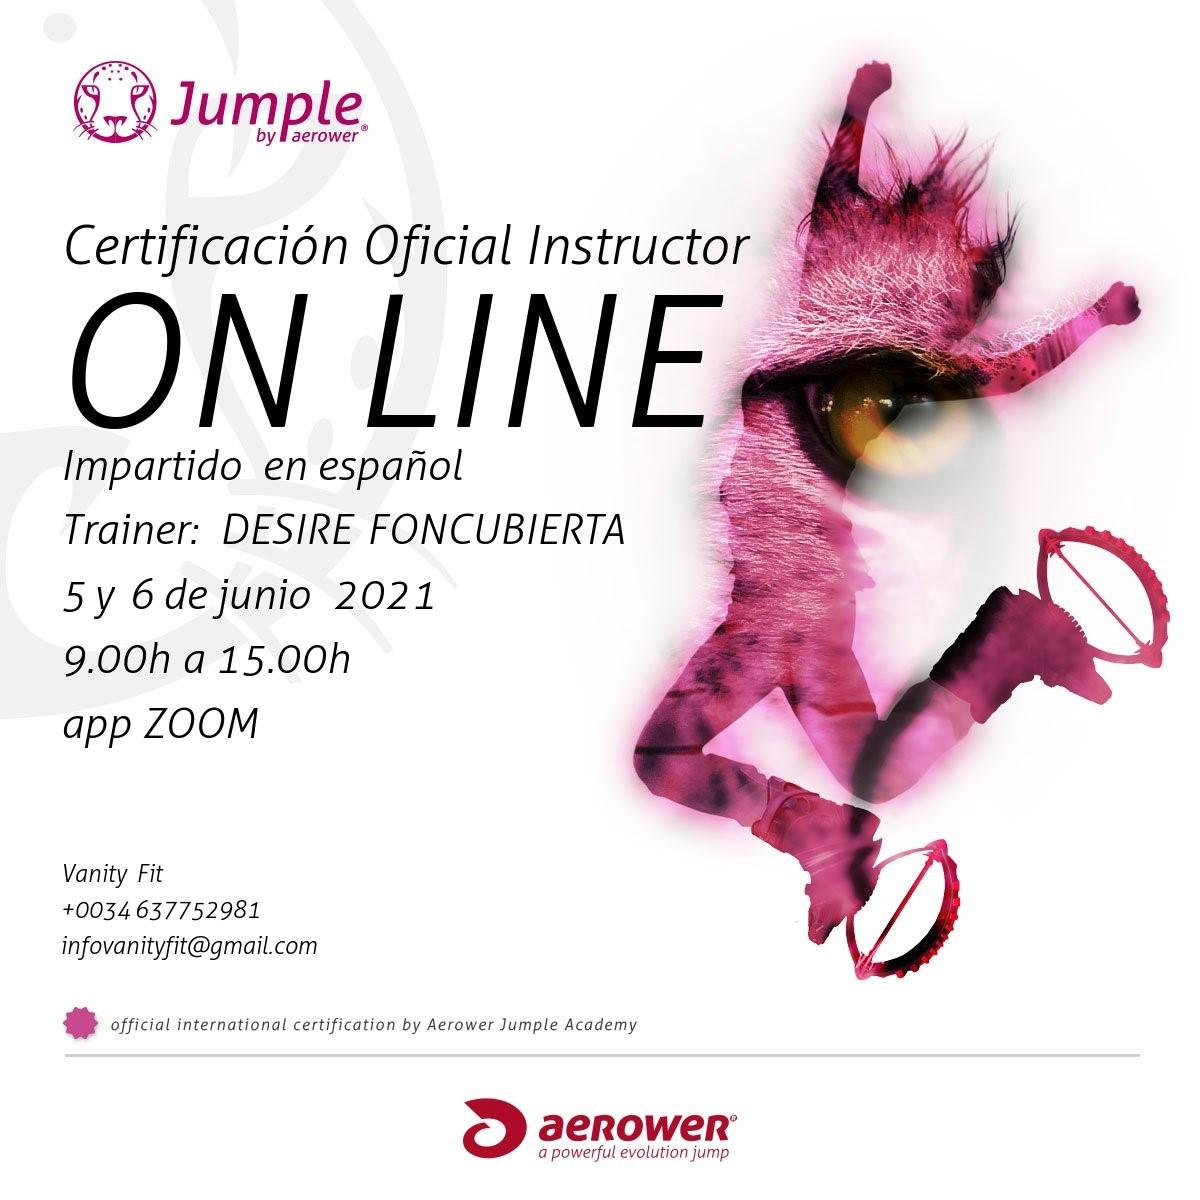 formacion instructor jumple aerower